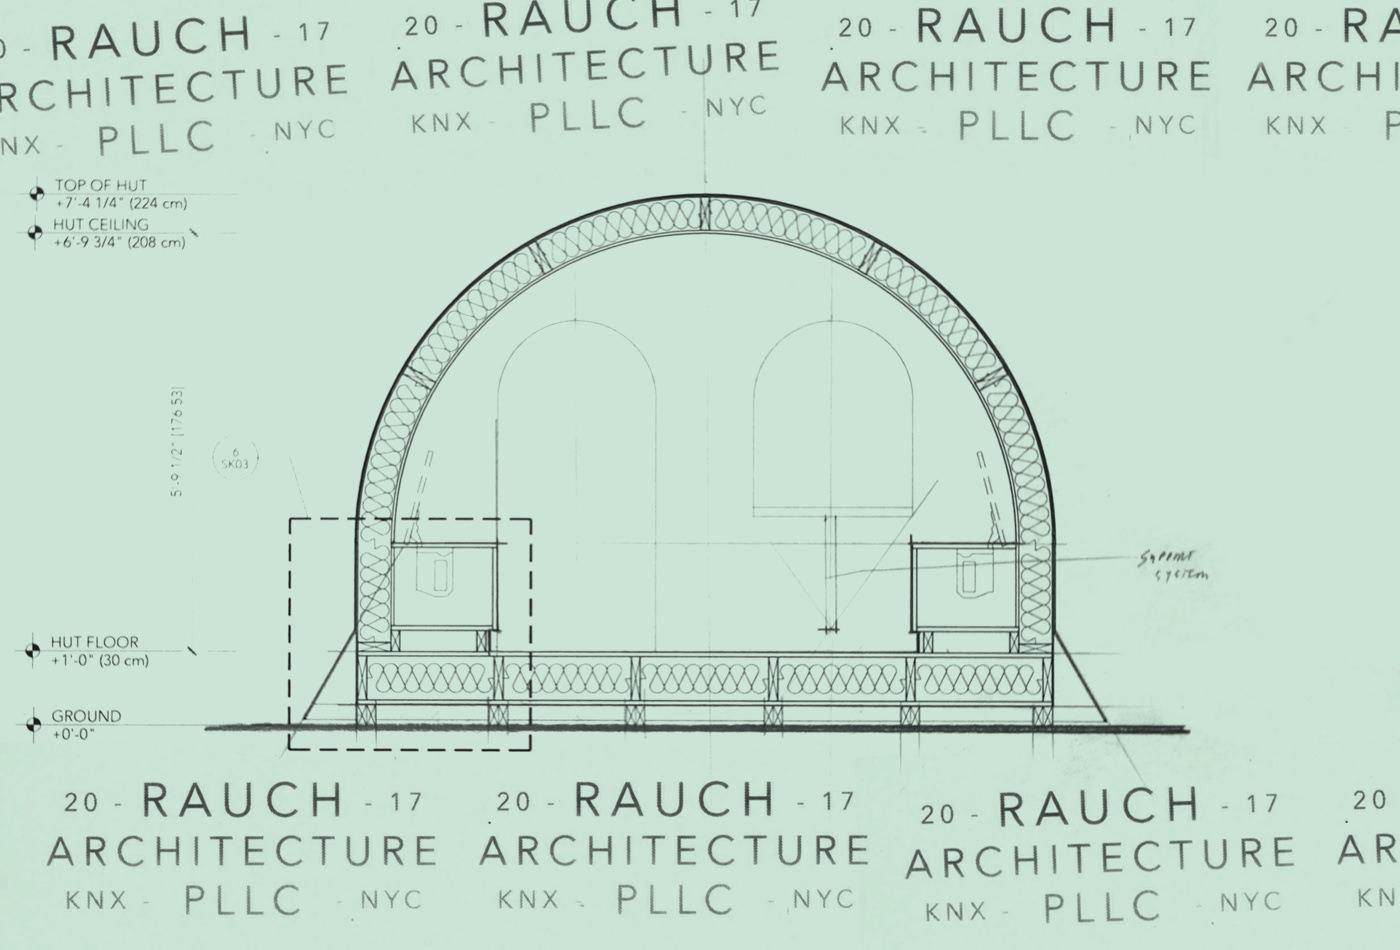 ra-rauch-architecture-matthew-rauch-architecture-pllc-nyc-brooklyn-knx-architect-ppx-modernism-passengerpigeonx-vacaliebres-marks-schematic-plan-NY